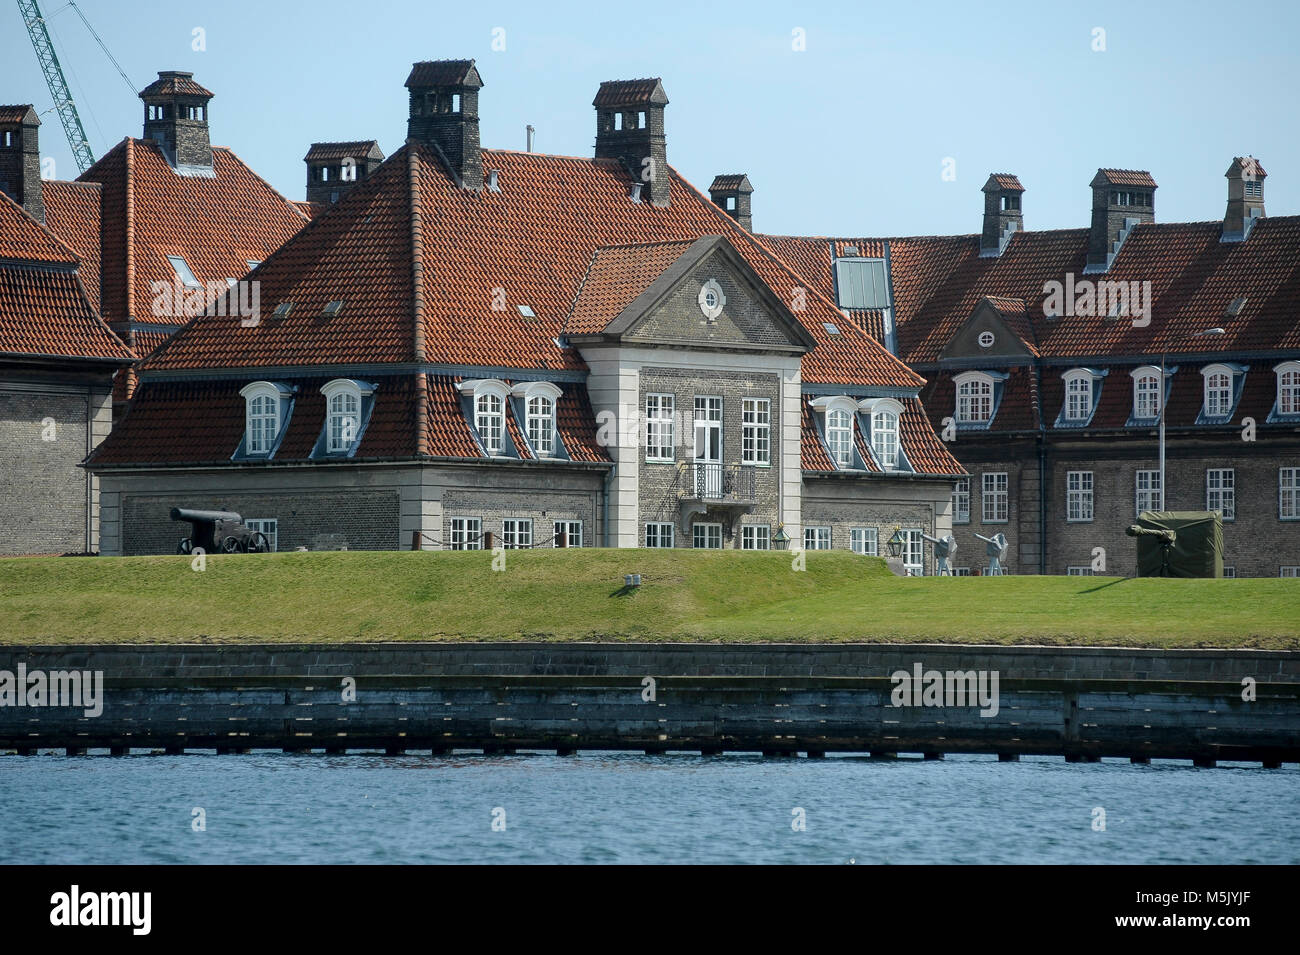 Old naval base at Holmen island in Copenhagen, Denmark, August 6th 2015 © Wojciech Strozyk / Alamy Stock Photo - Stock Image